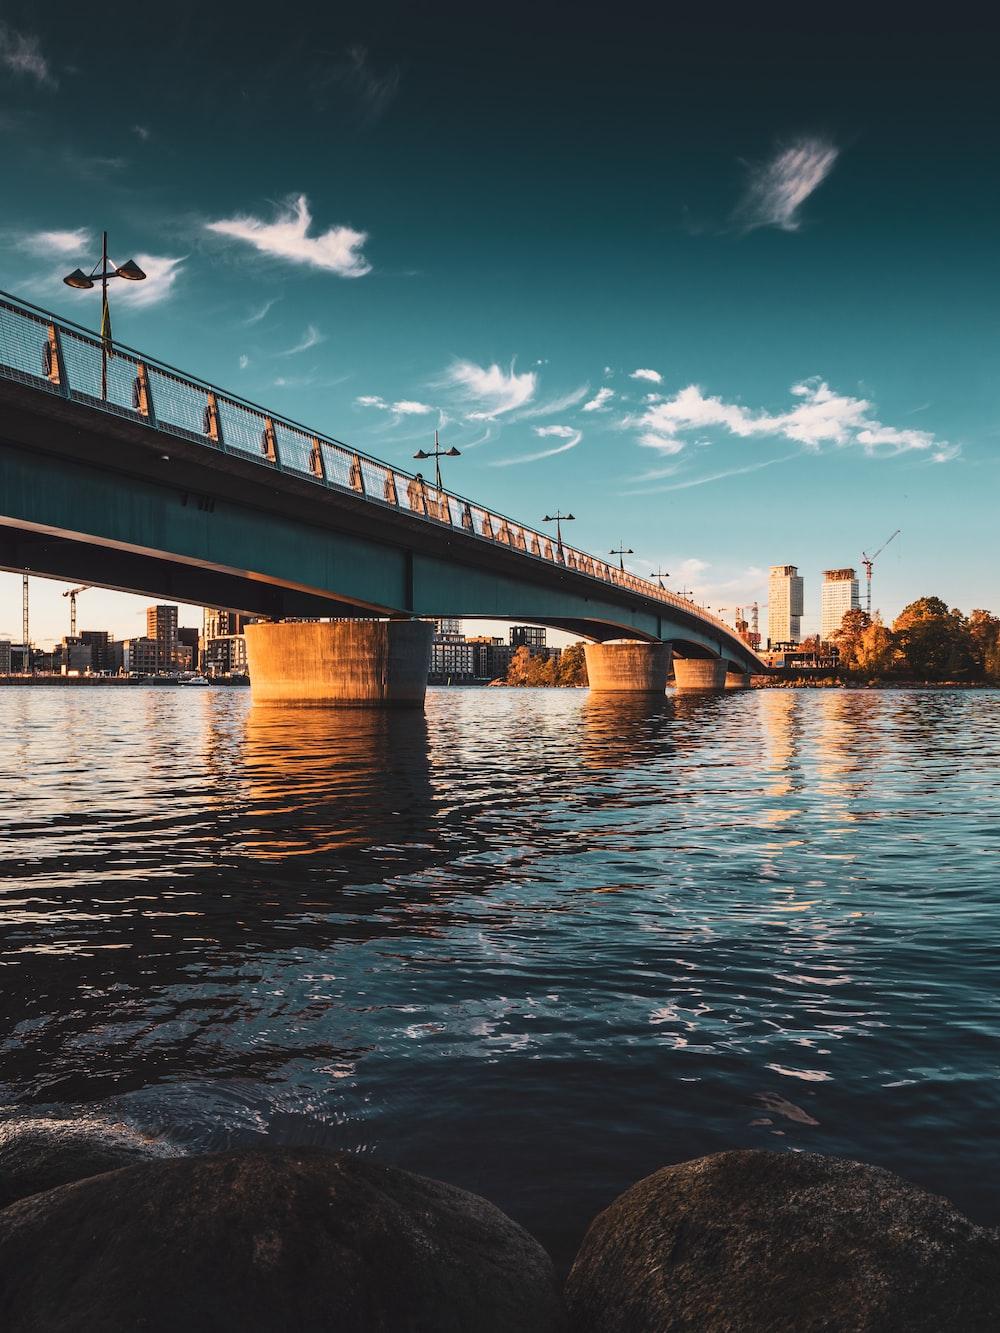 brown bridge over water under blue sky during daytime